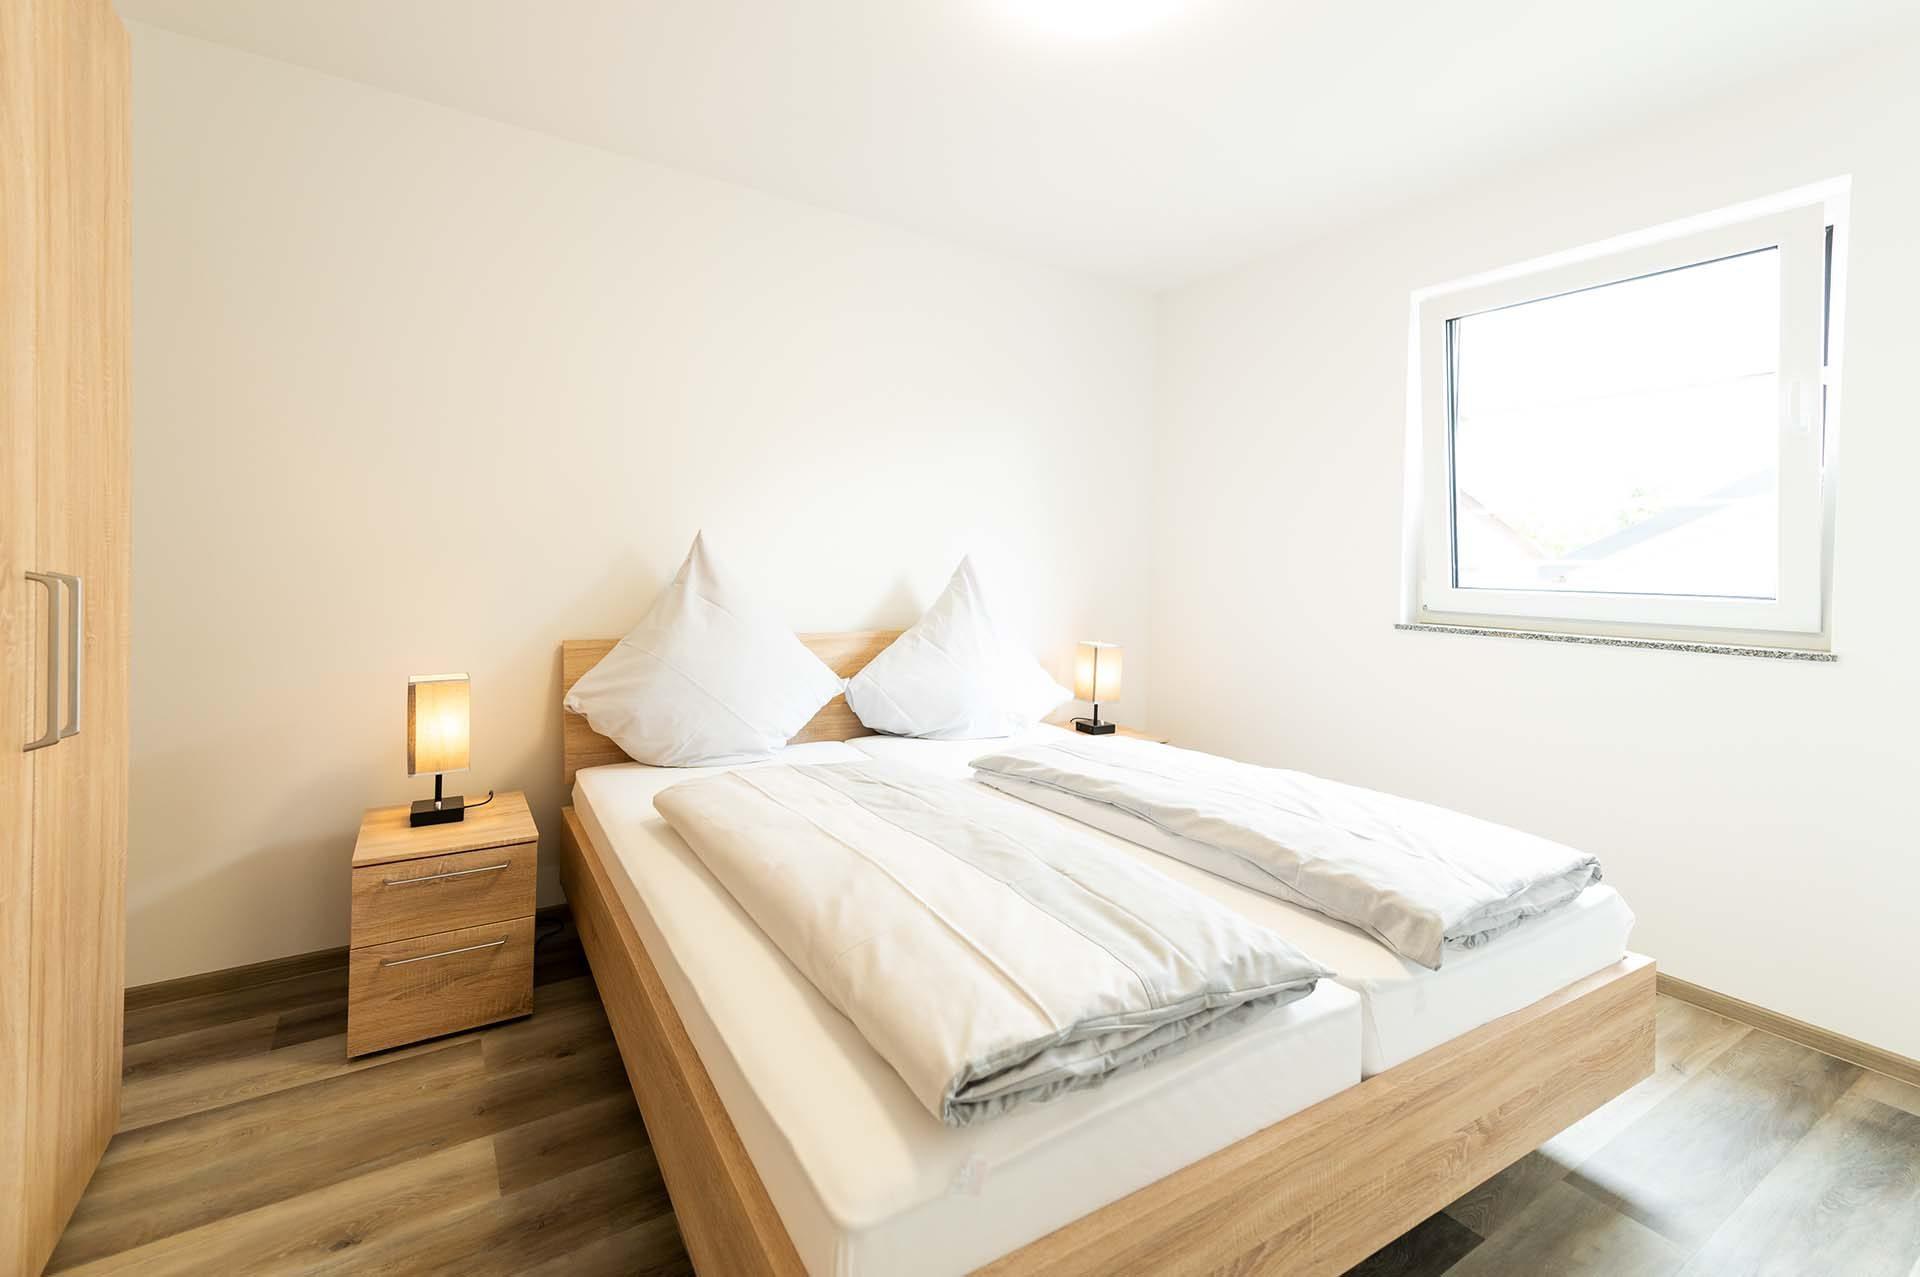 appartement-völklinger-hütte-schlafzimmer